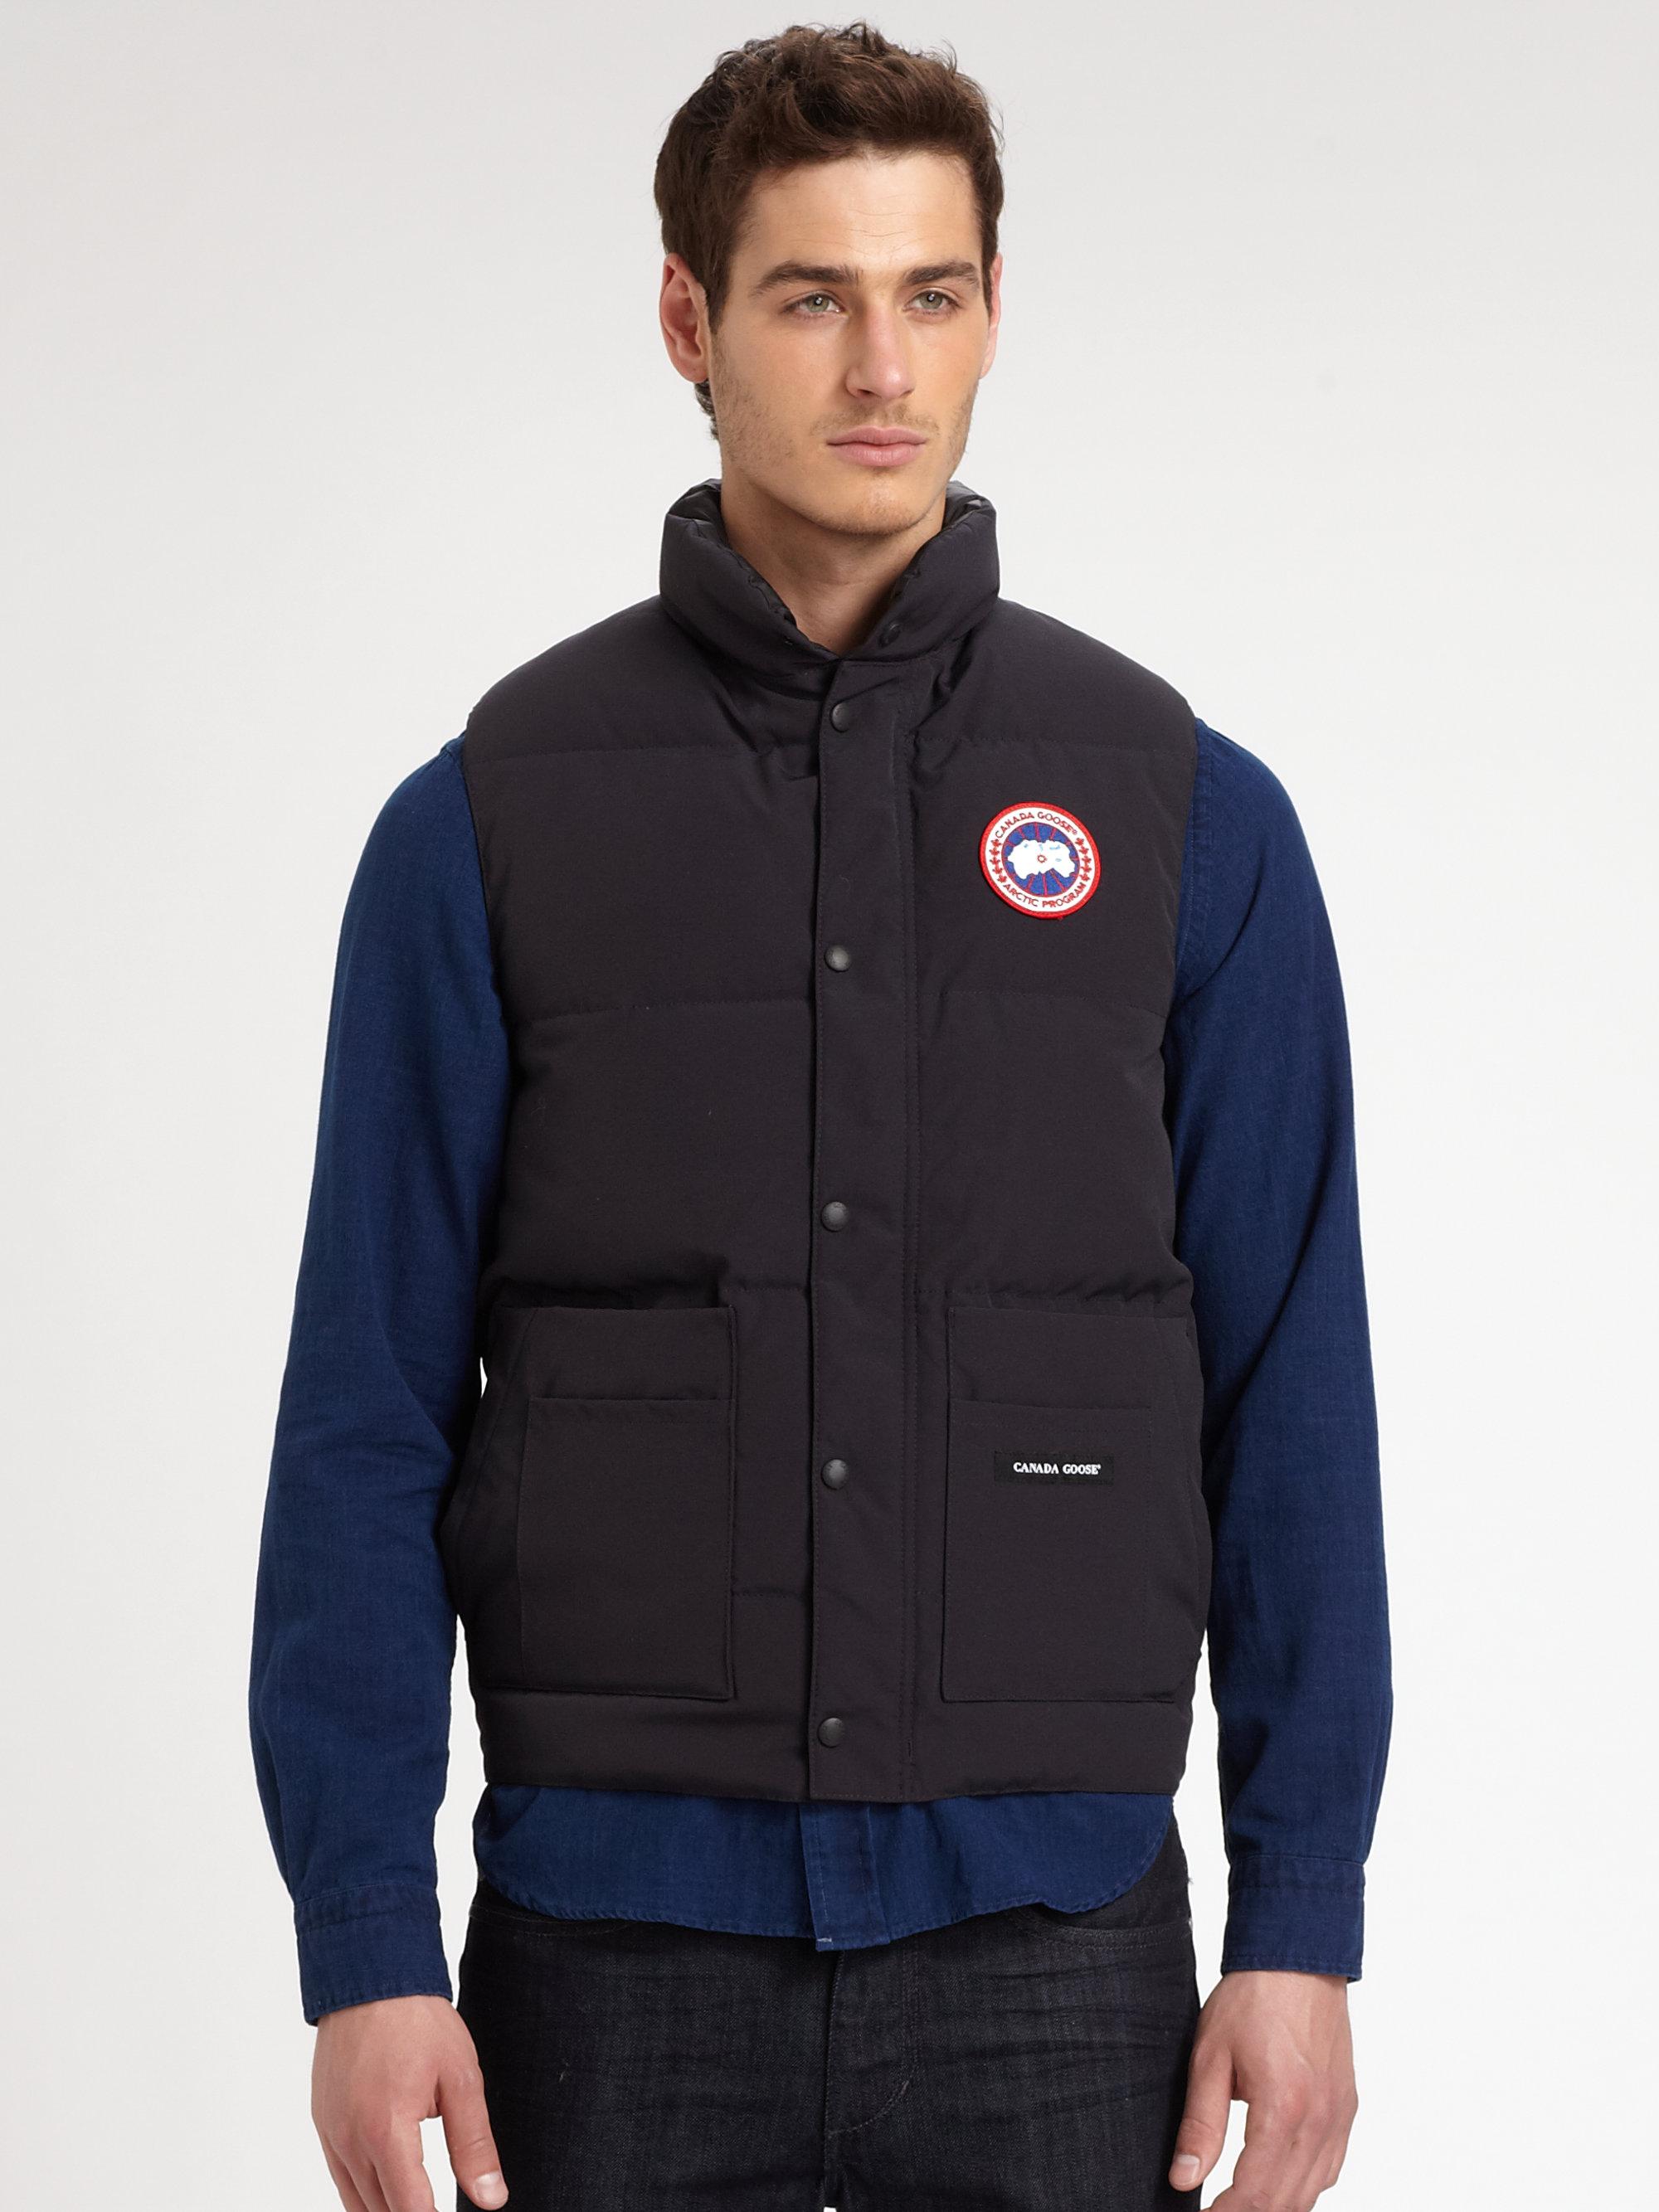 Lyst - Canada Goose Freestyle Vest in Blue for Men 0f17112ef